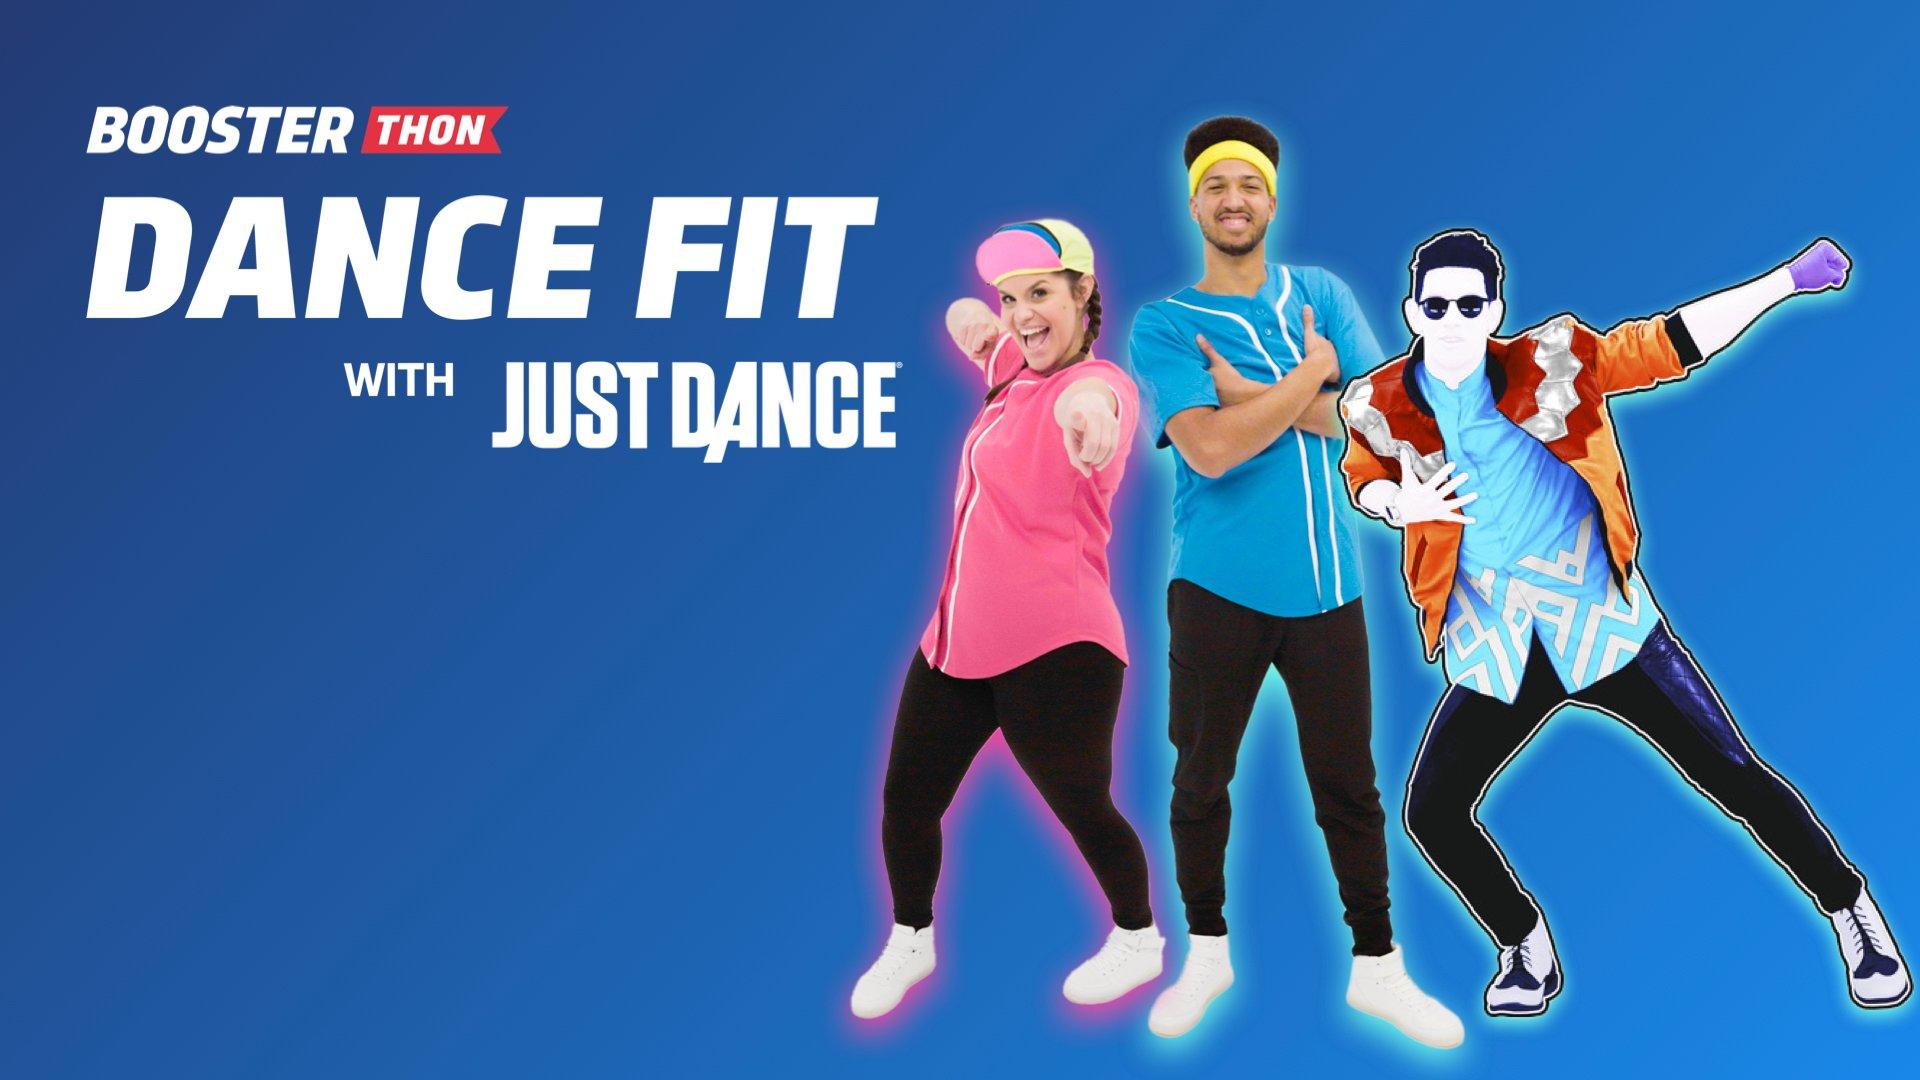 Just-Dance_Image.001